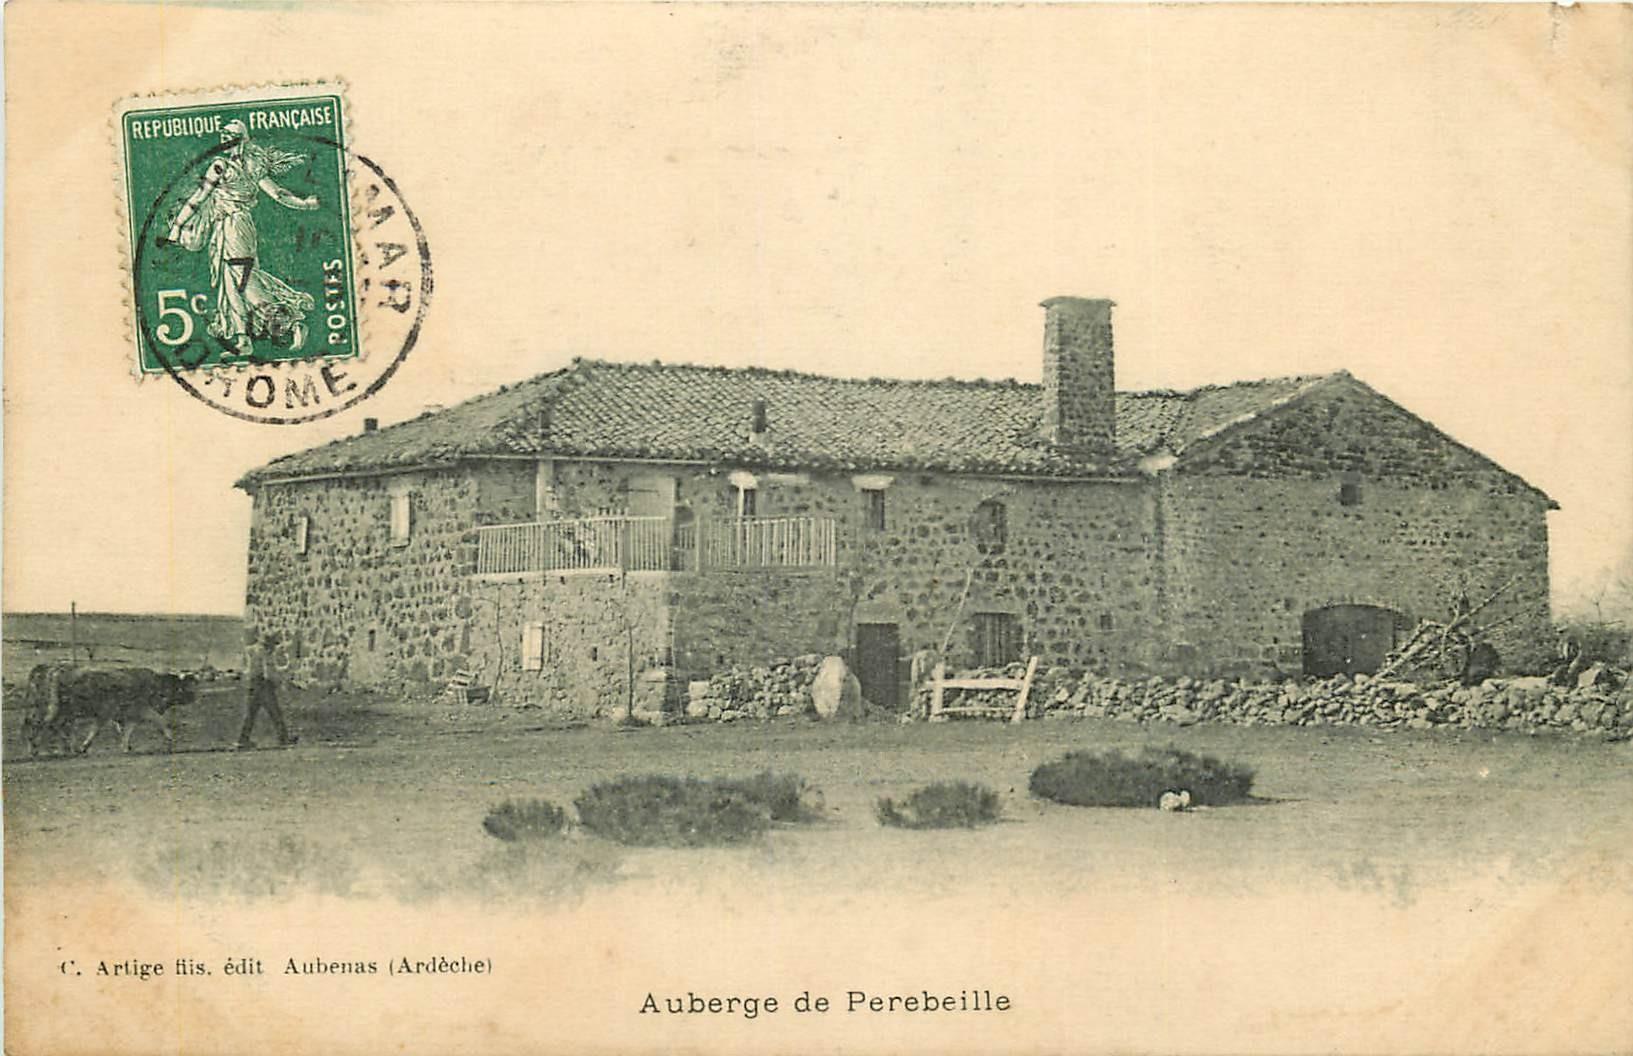 07 Auberge de Perebeille